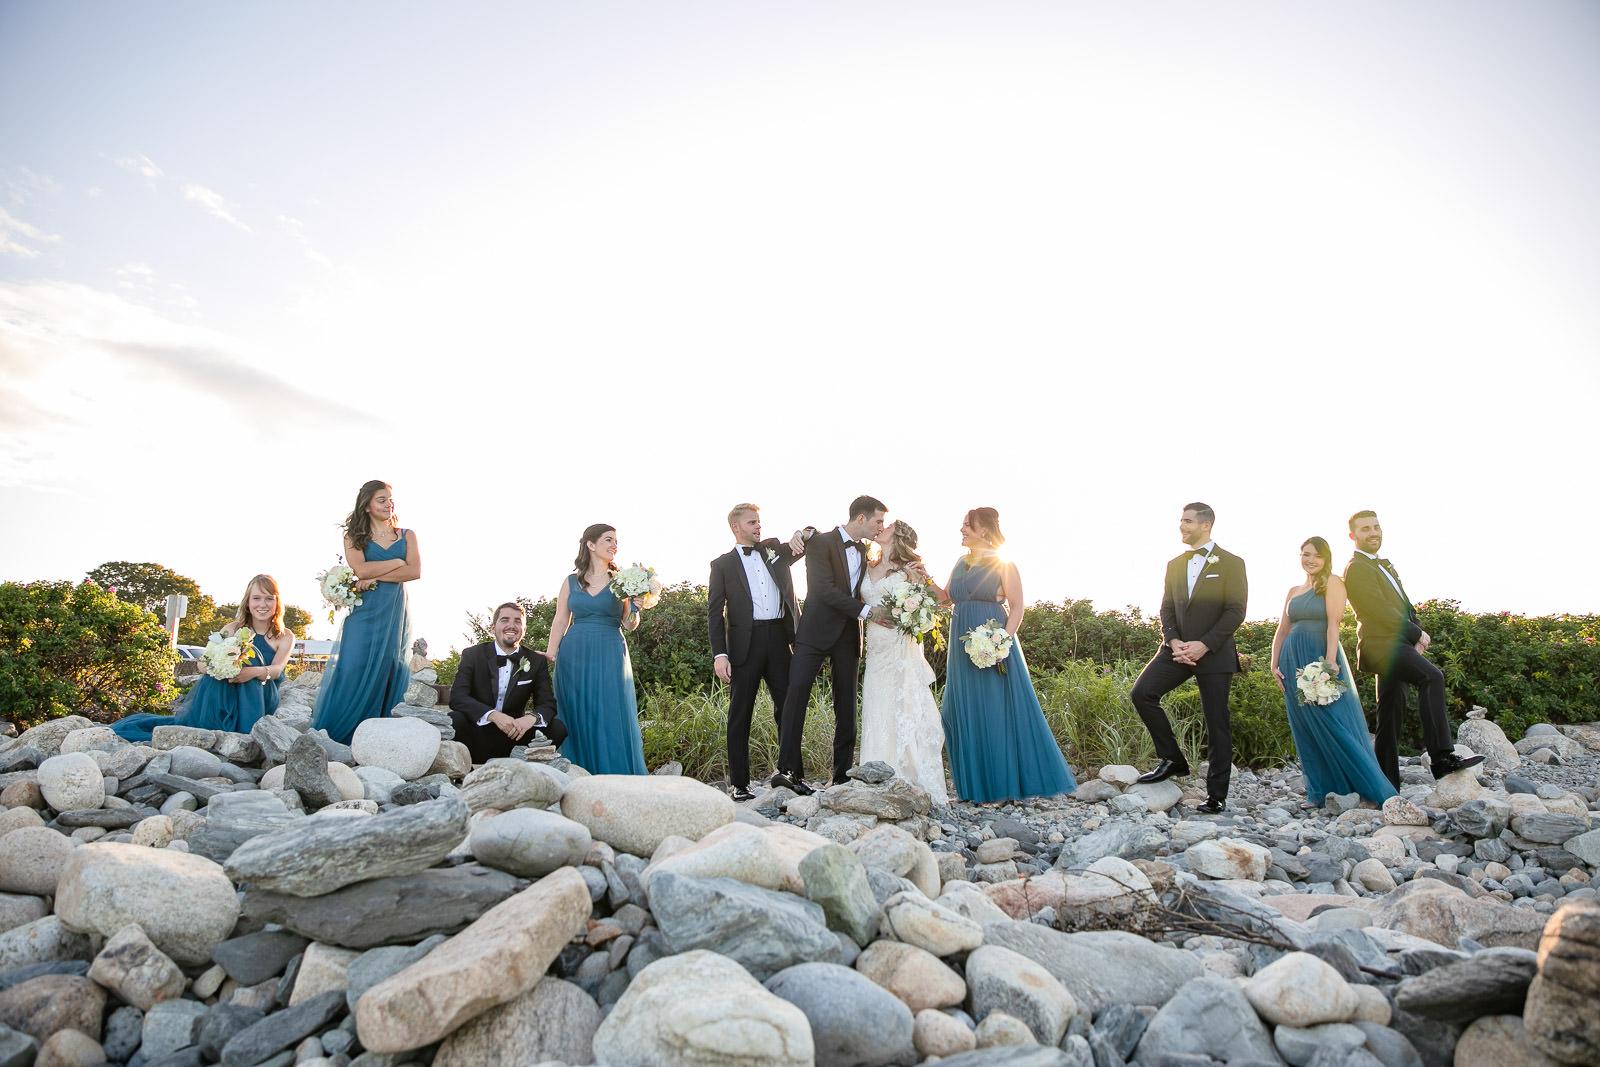 Wedding, Narragansett Towers, The Towers, Narragansett, Rhode Island, RI, Tracy Jenkins photography, RI wedding photographer, Rhode Island wedding photographer, wedding party, wedding formals, navy dresses